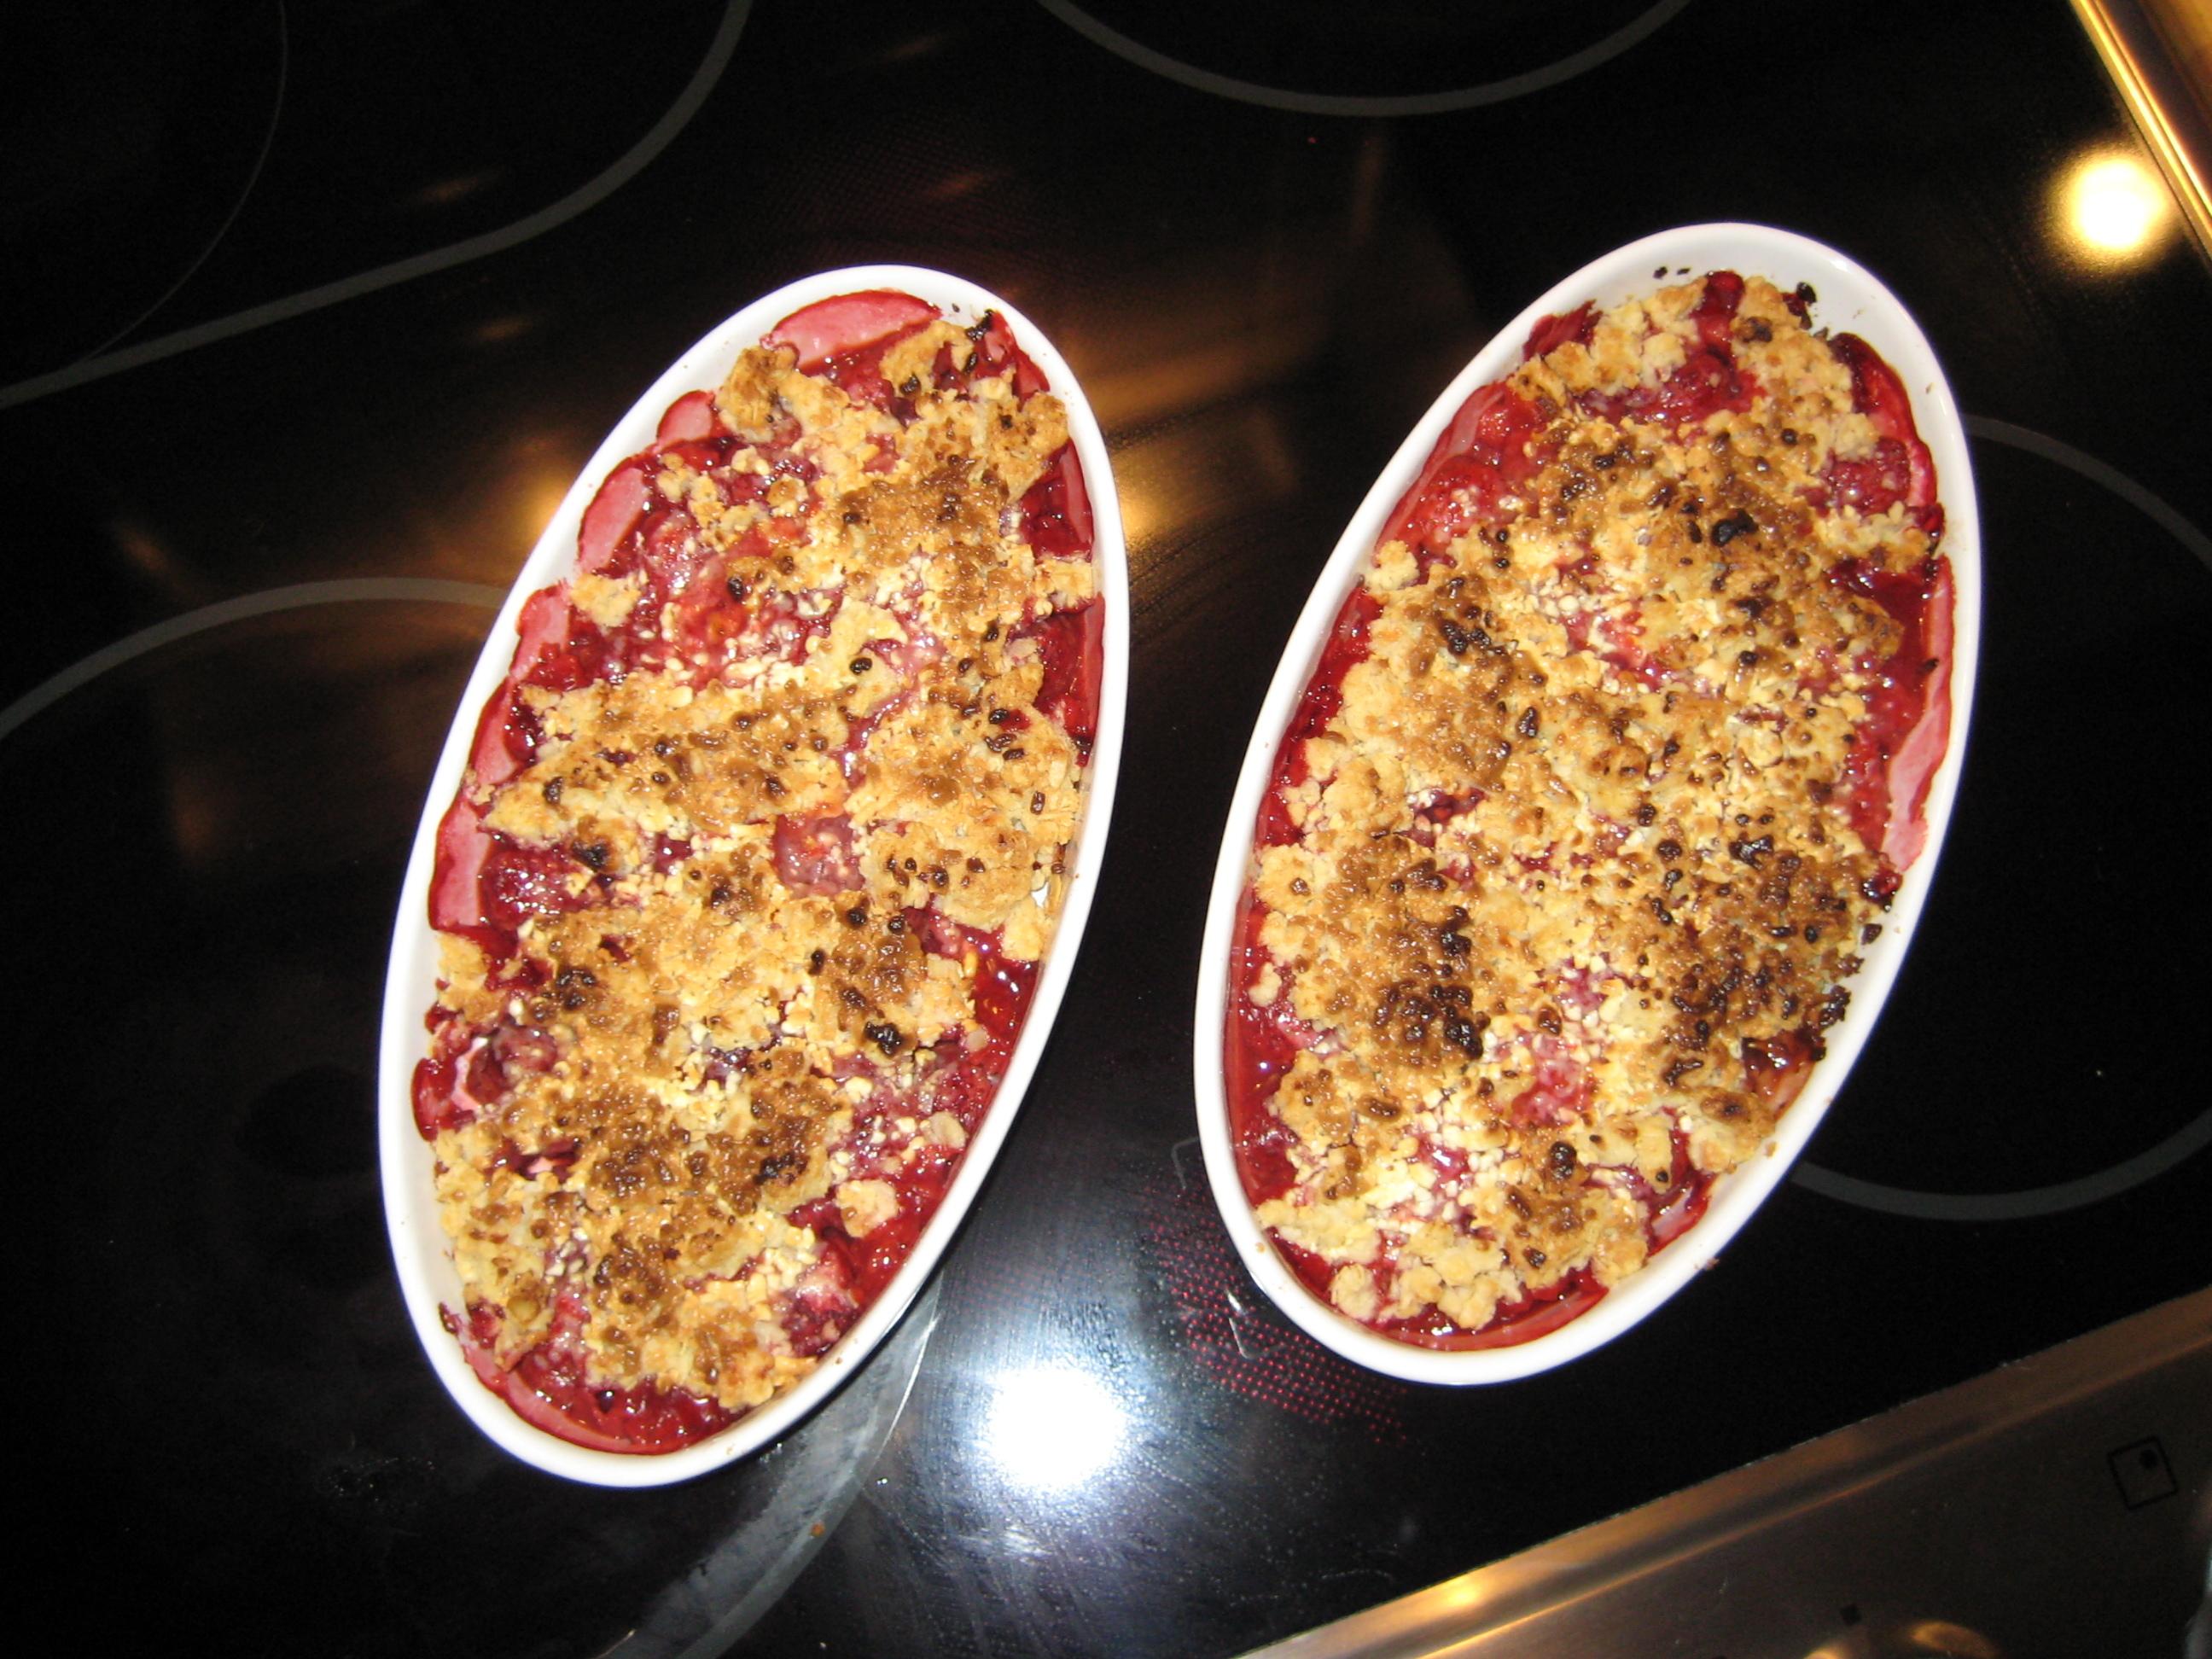 rabarbersoppa jordgubb vanilj